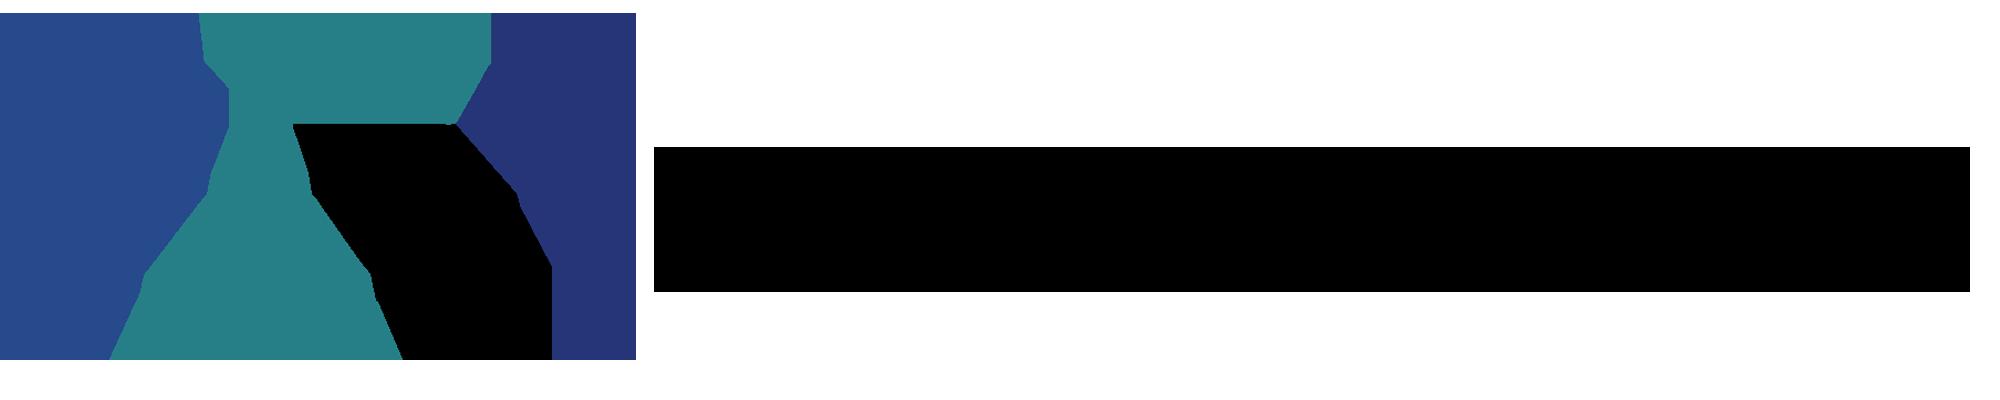 400dpiLogoCropped-long